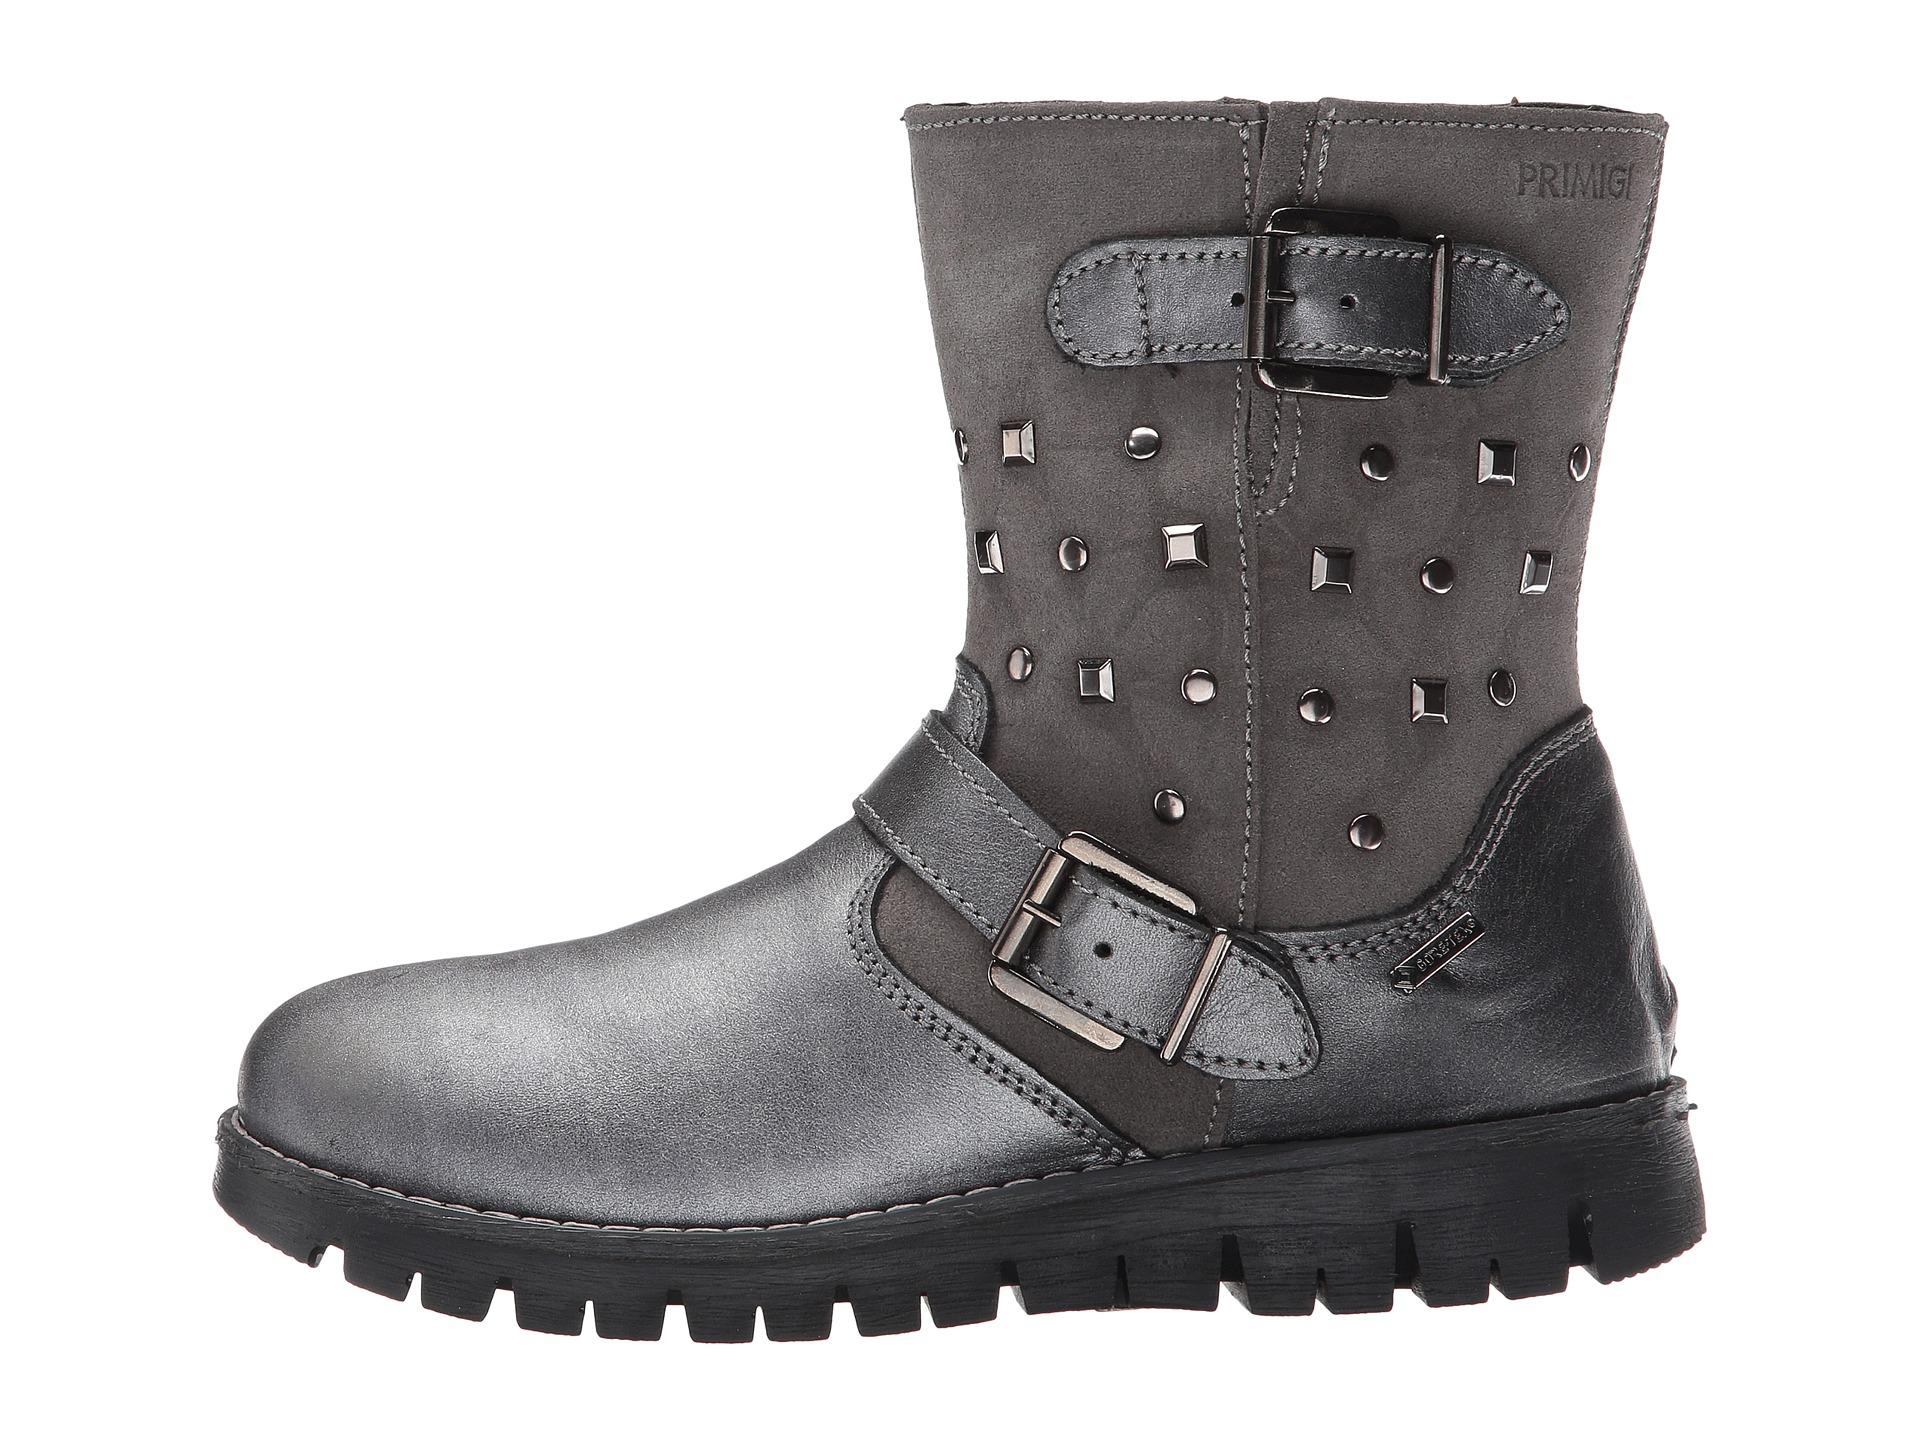 30a50f2a002 New Zealand Ugg Type Boots - cheap watches mgc-gas.com